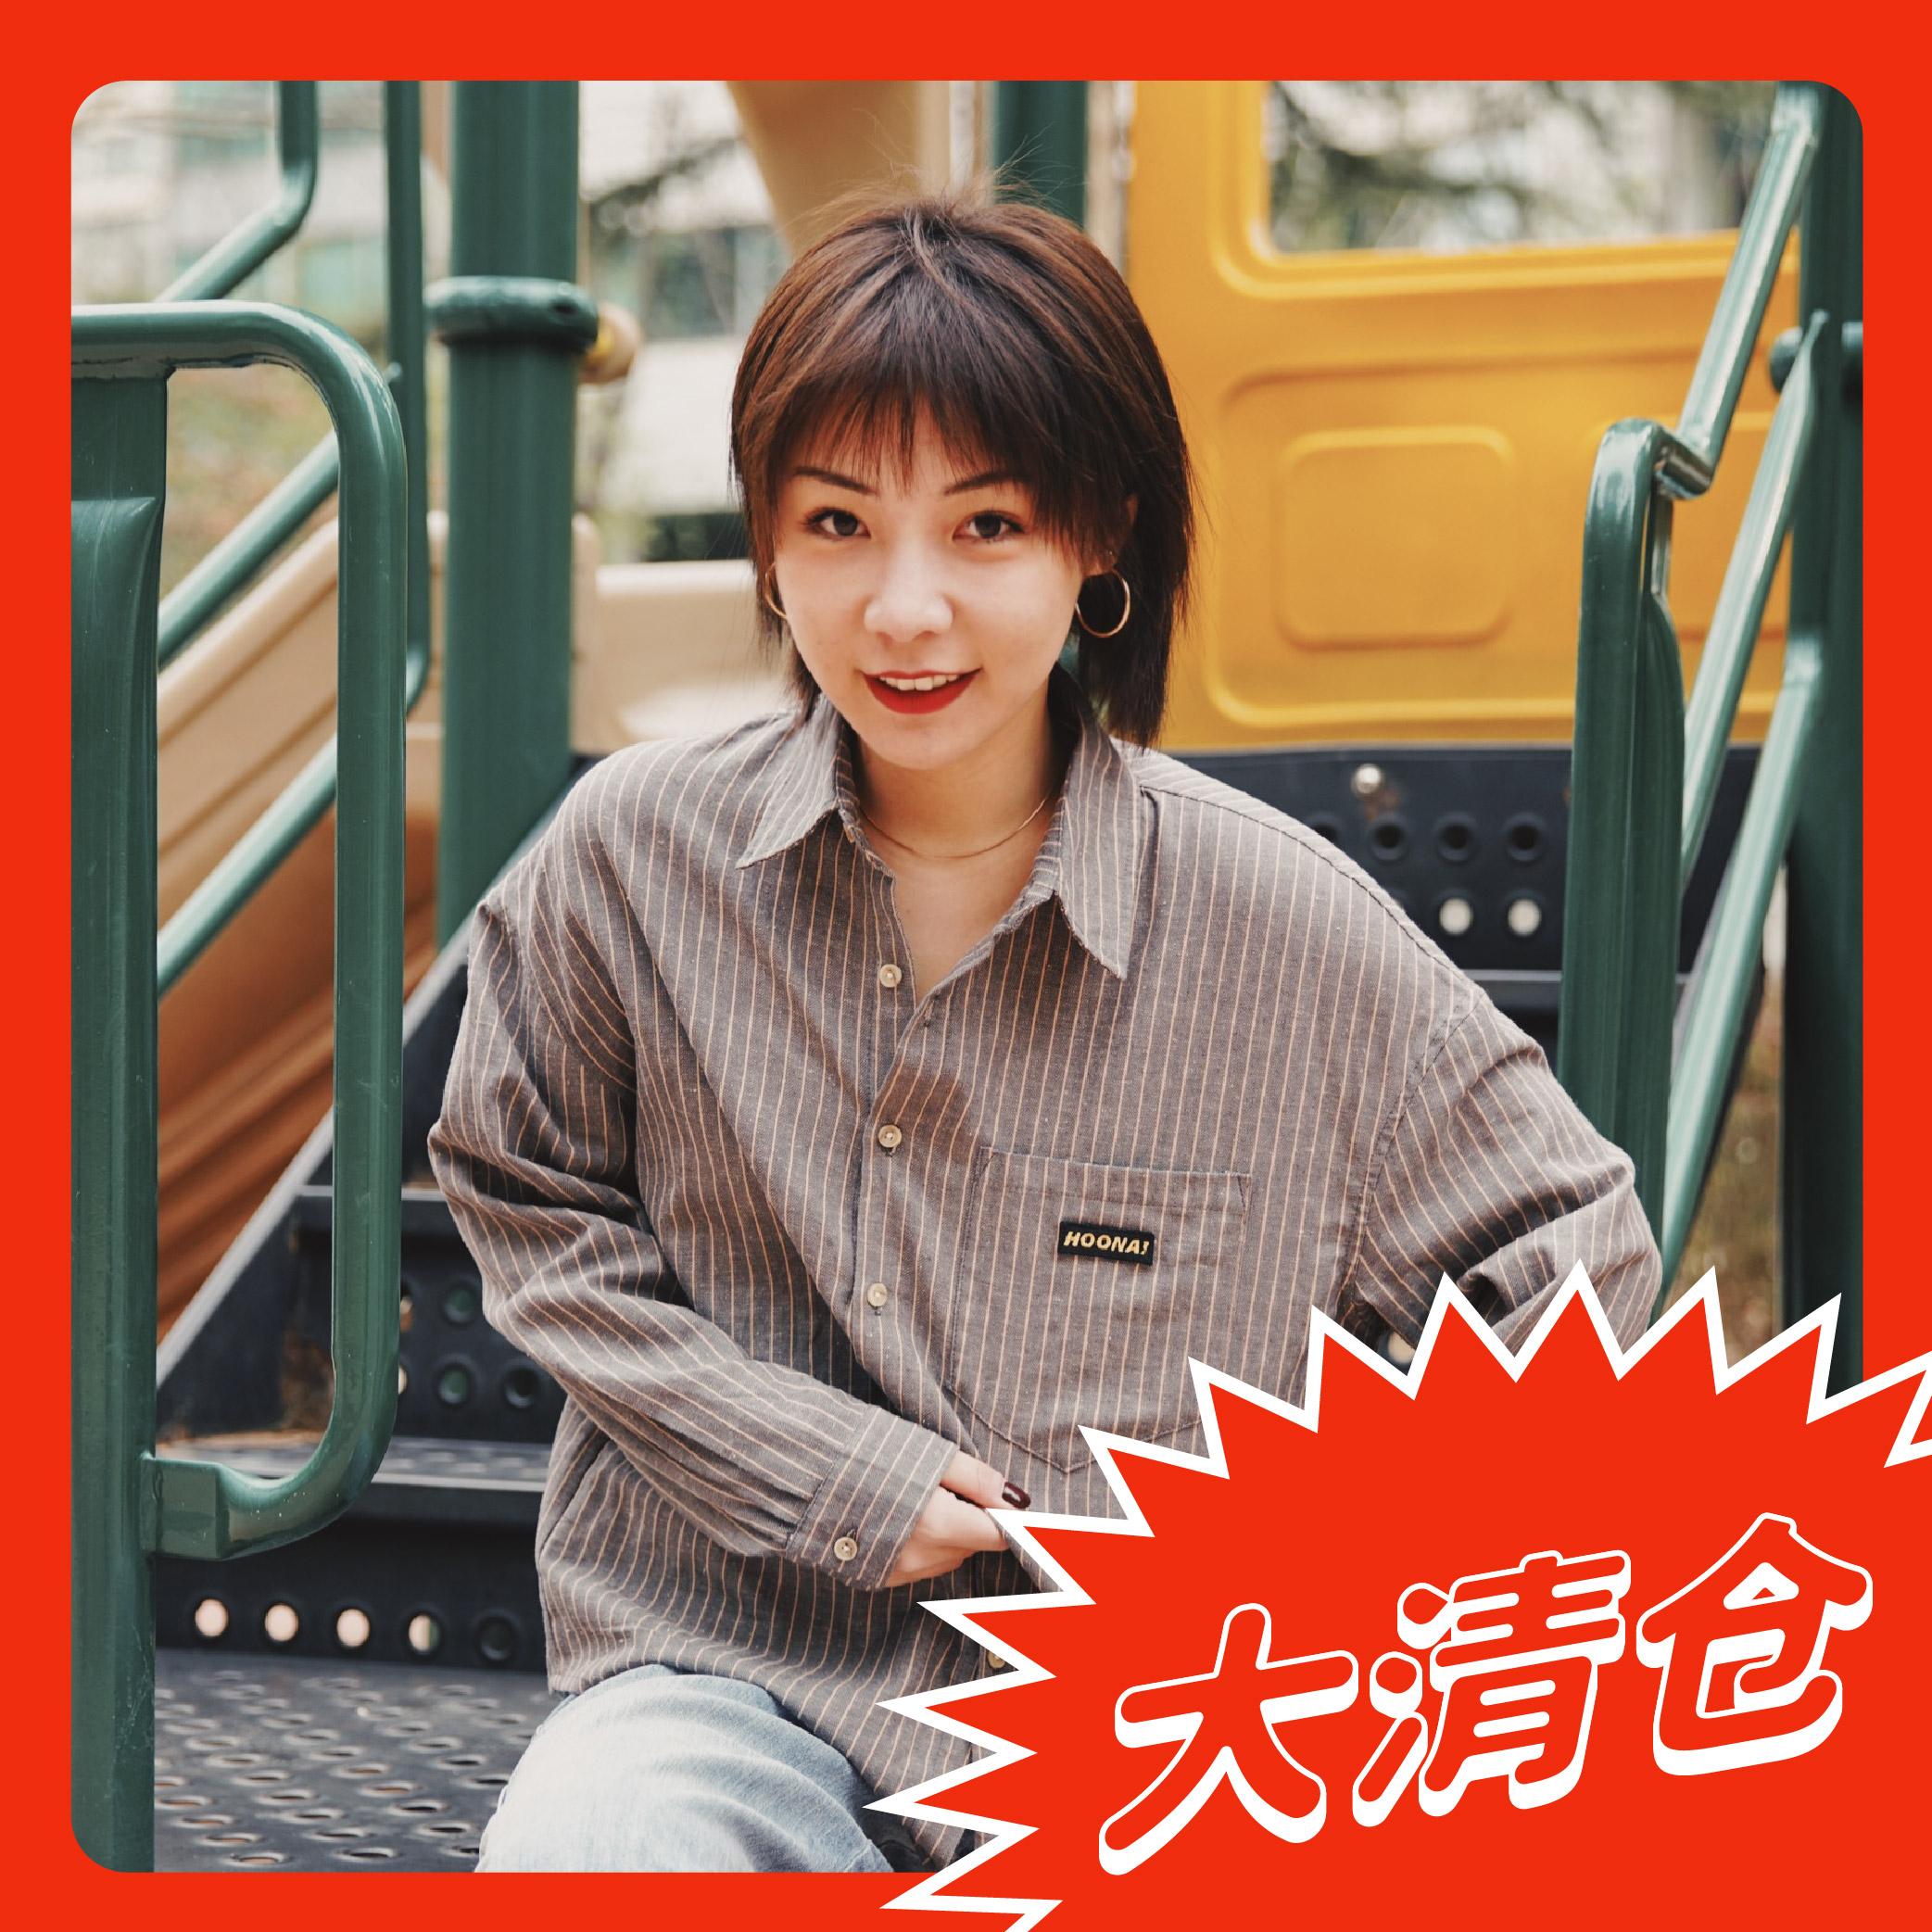 Hoona original design shirt spring and autumn loose cotton hemp thin striped shirt for men and women